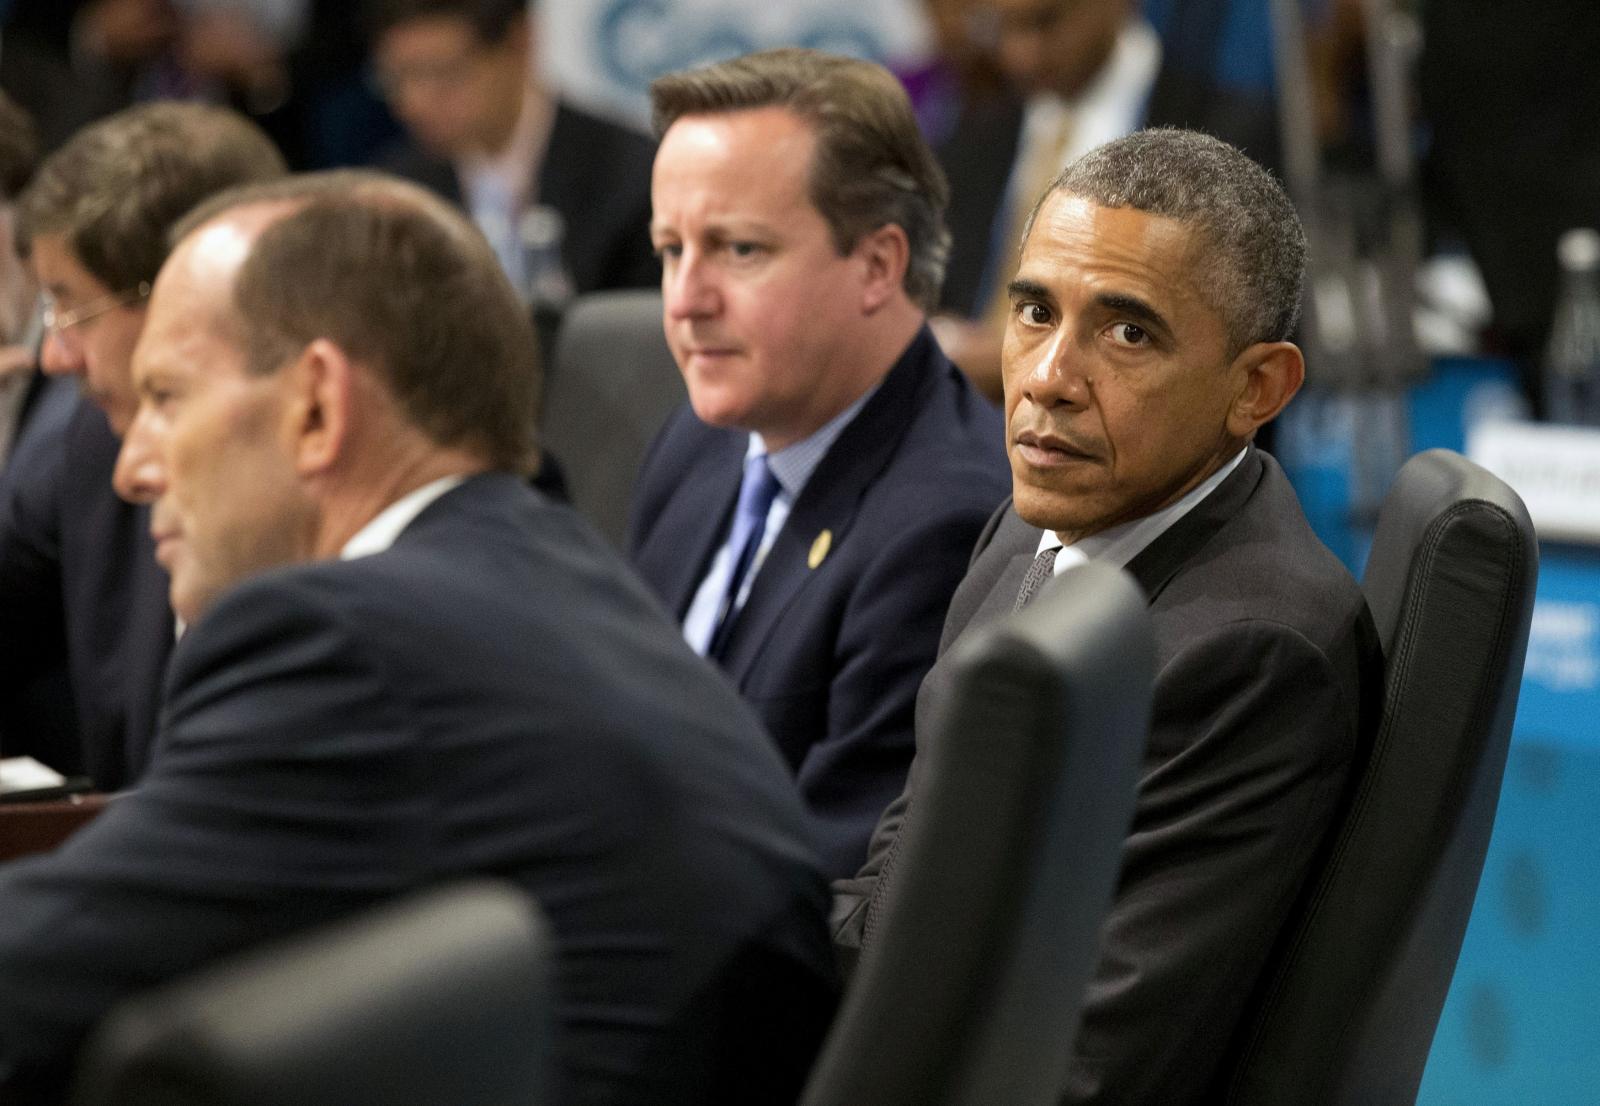 Cameron, Abbott and Obama